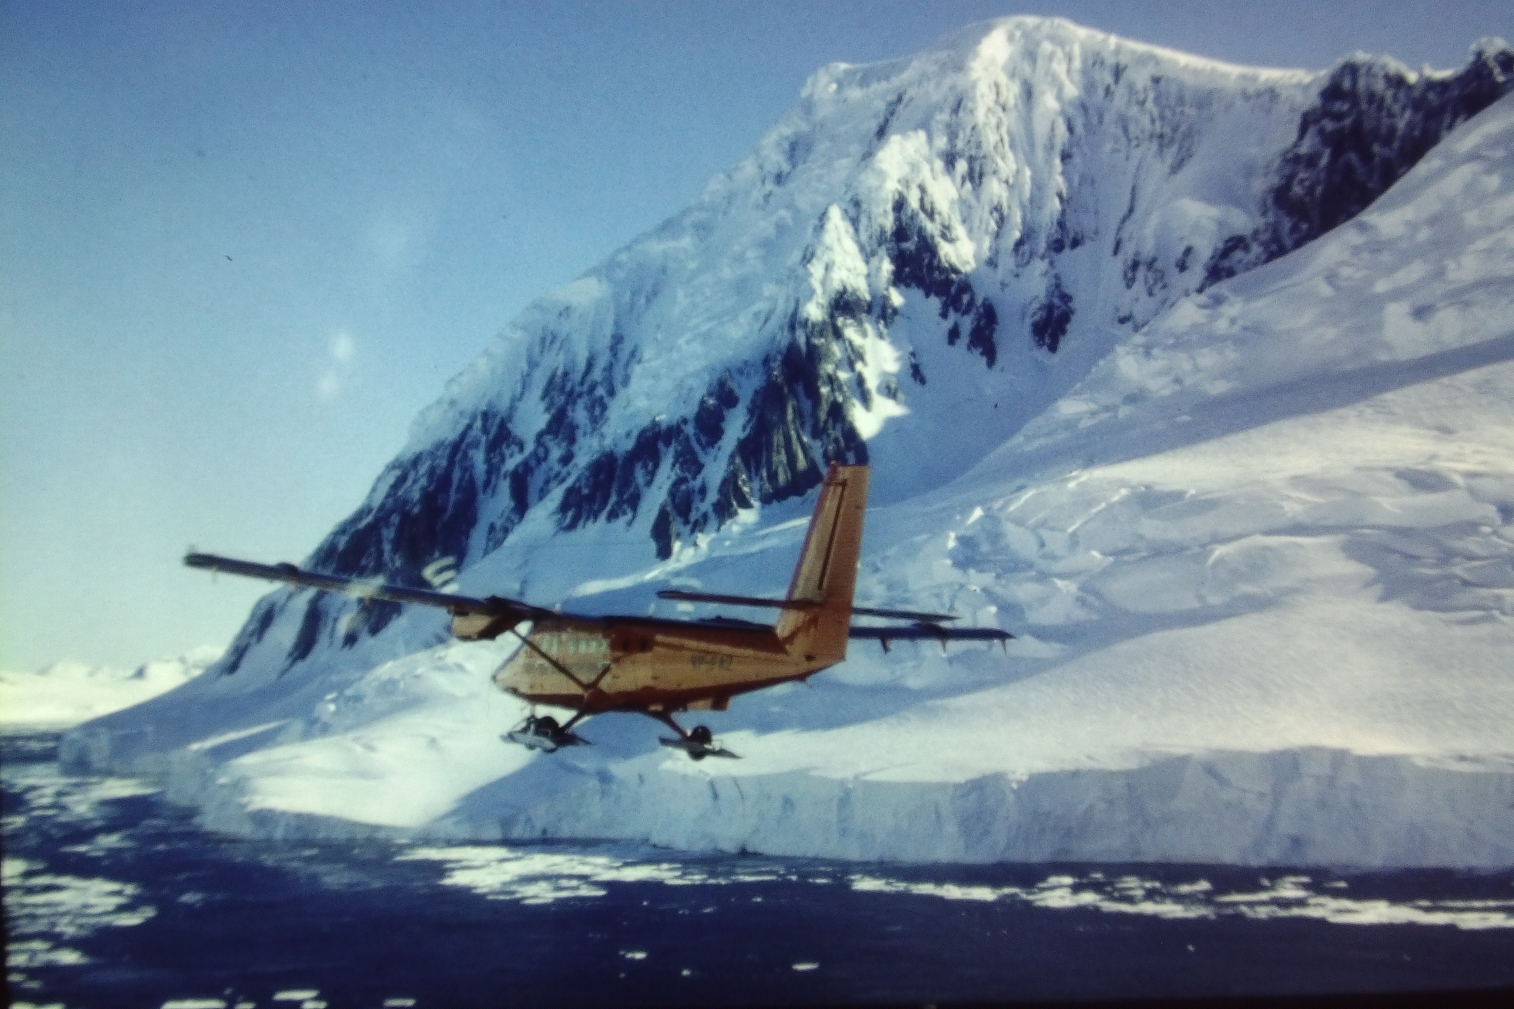 antarctic 024_copy_1514x1009.jpg